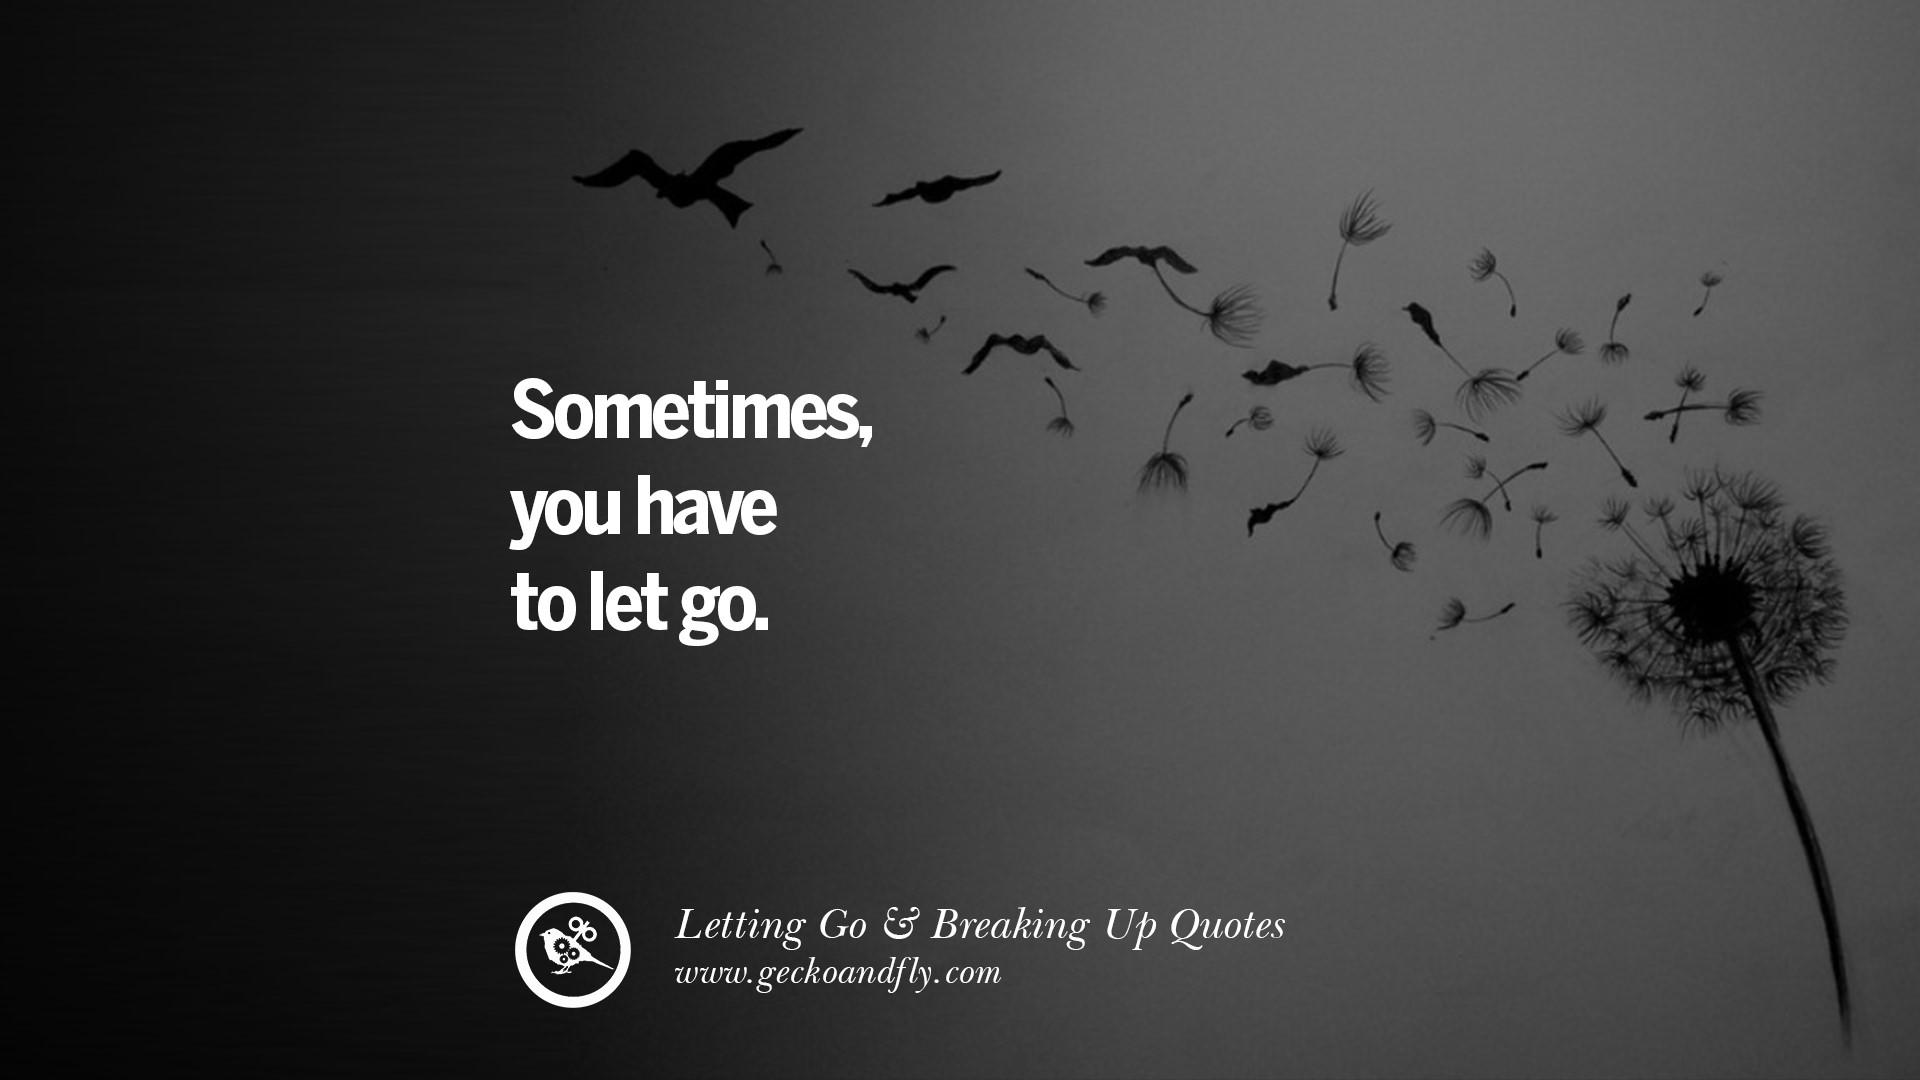 I Have Let Go